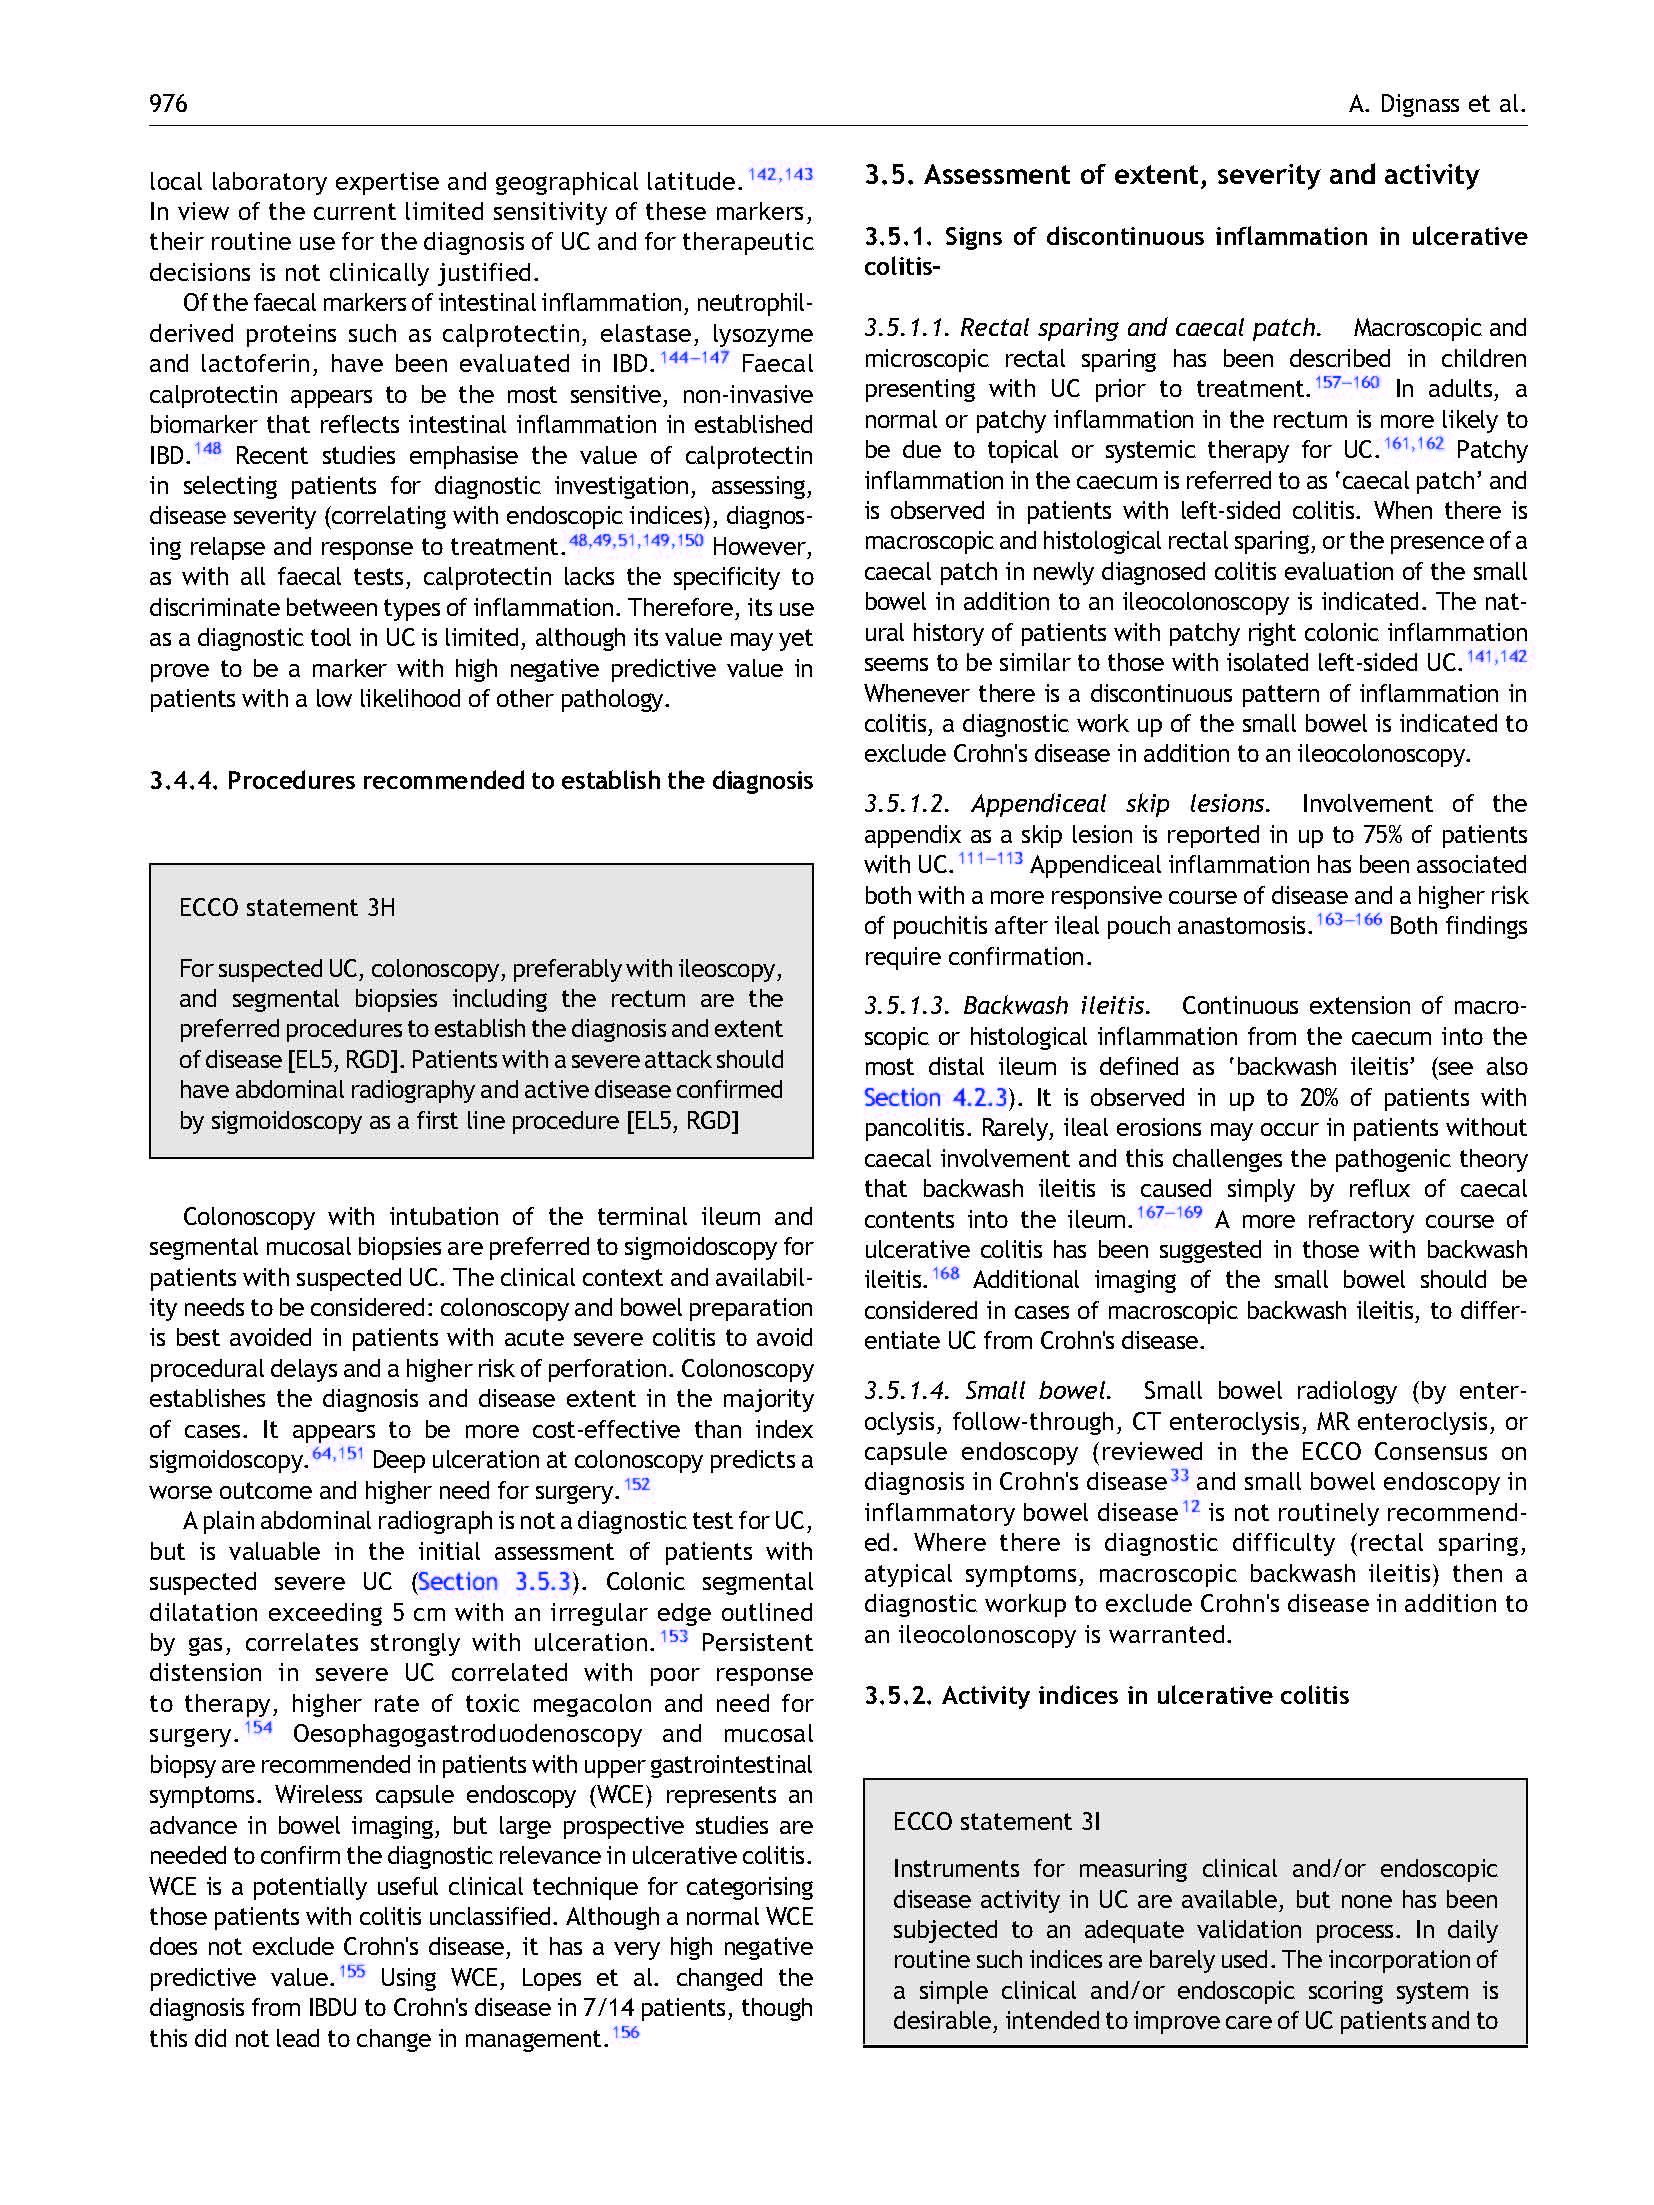 2012-ECCO第二版-欧洲询证共识:溃疡性结肠炎的诊断和处理—定义与诊断_页面_12.jpg